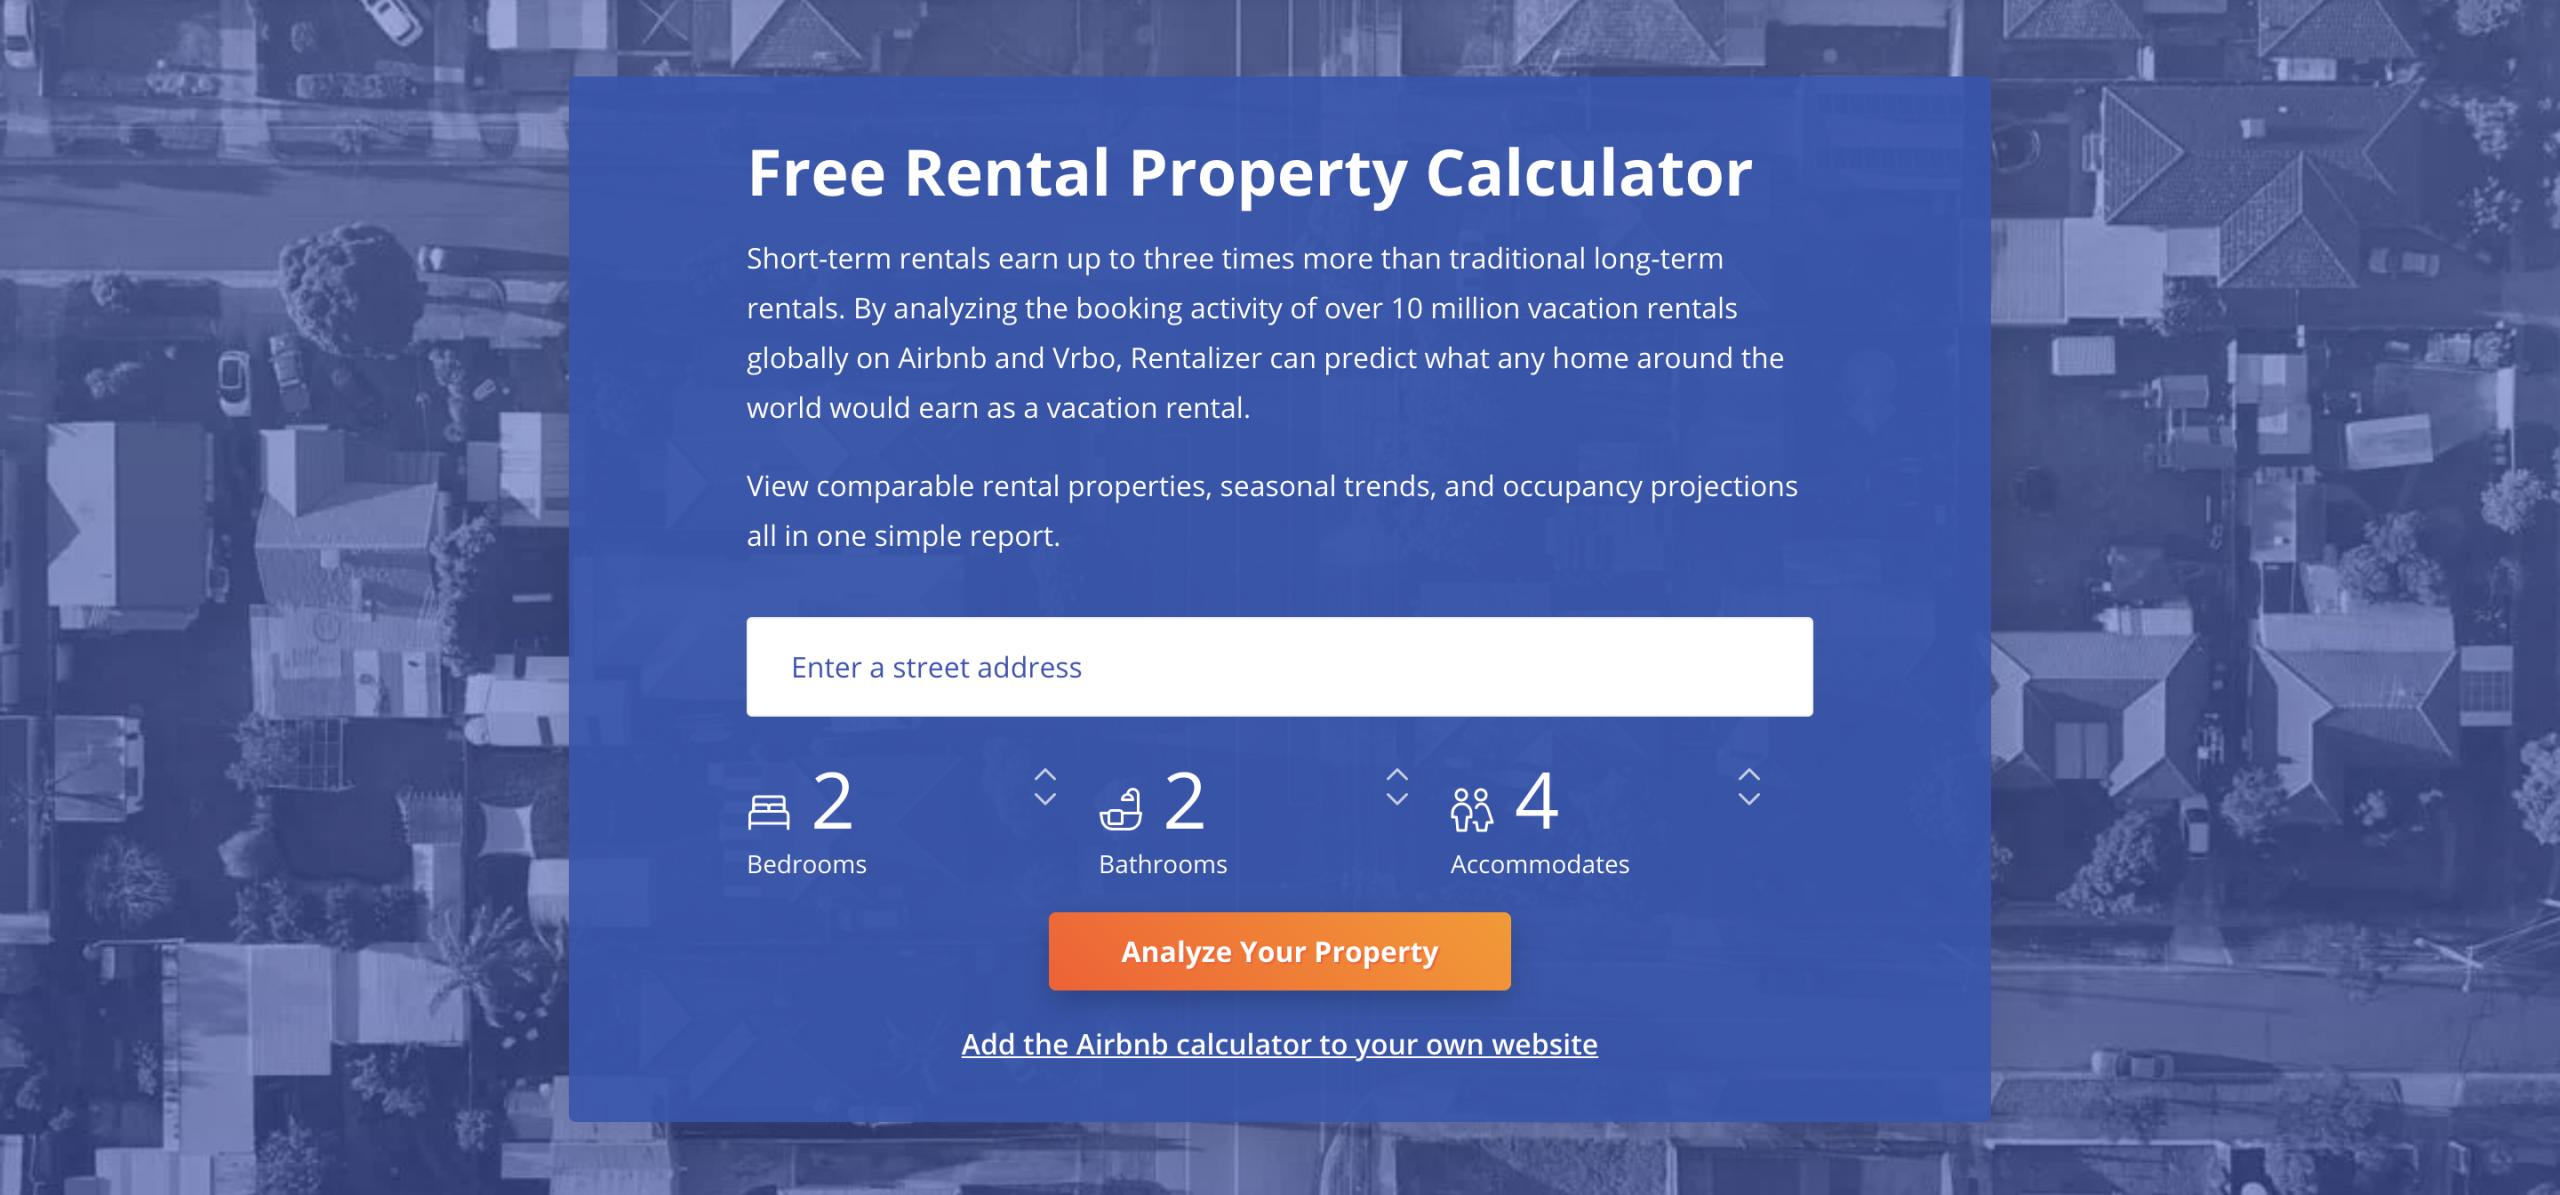 Image of a rental property calculator